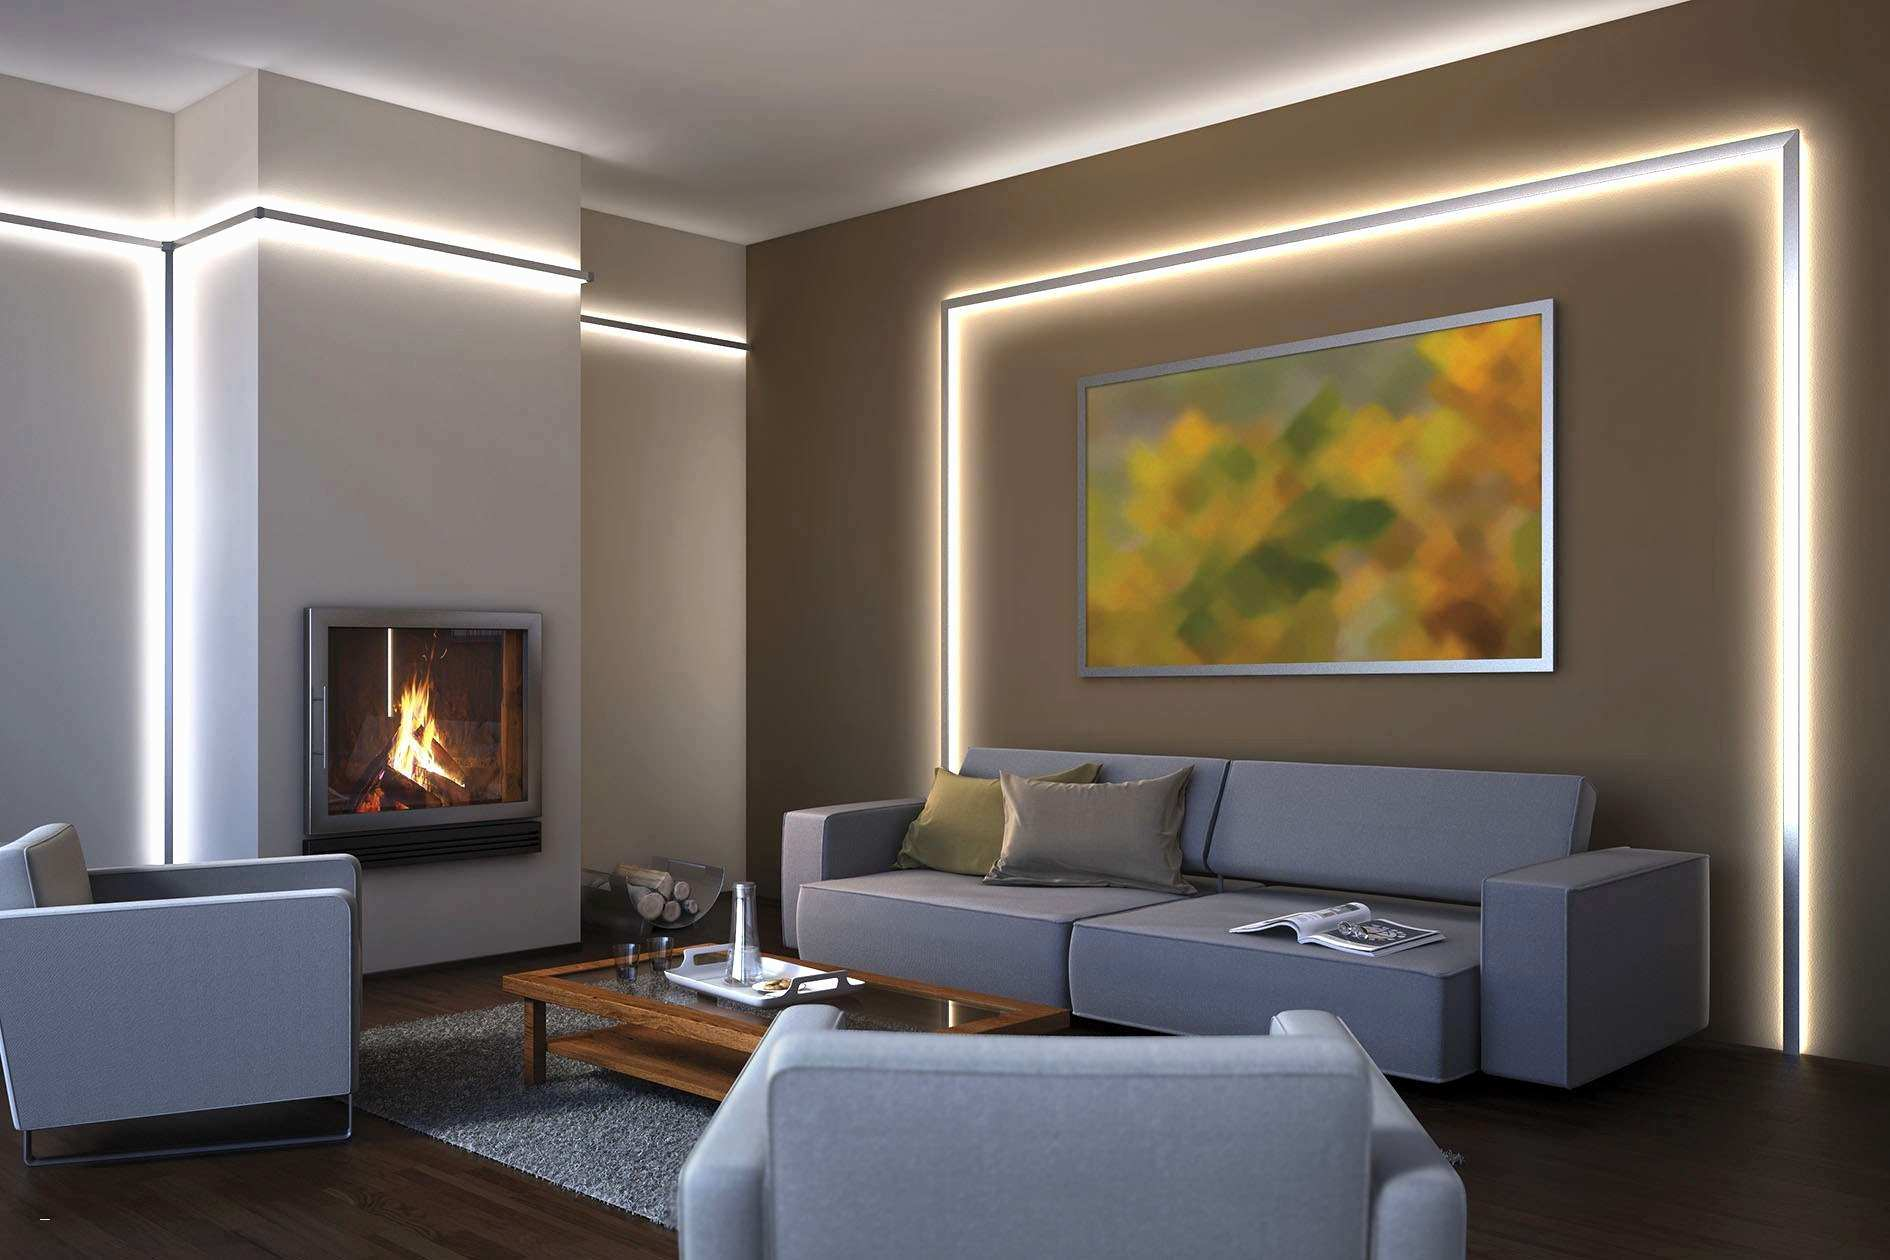 Full Size of Wohnzimmer Beleuchtung Wohnwand Led Planen Spots Indirekte Decke Modern Wieviel Lumen Tipps Ideen Lampen Leiste Selber Bauen Schn Badezimmer Deko Board Wohnzimmer Wohnzimmer Beleuchtung